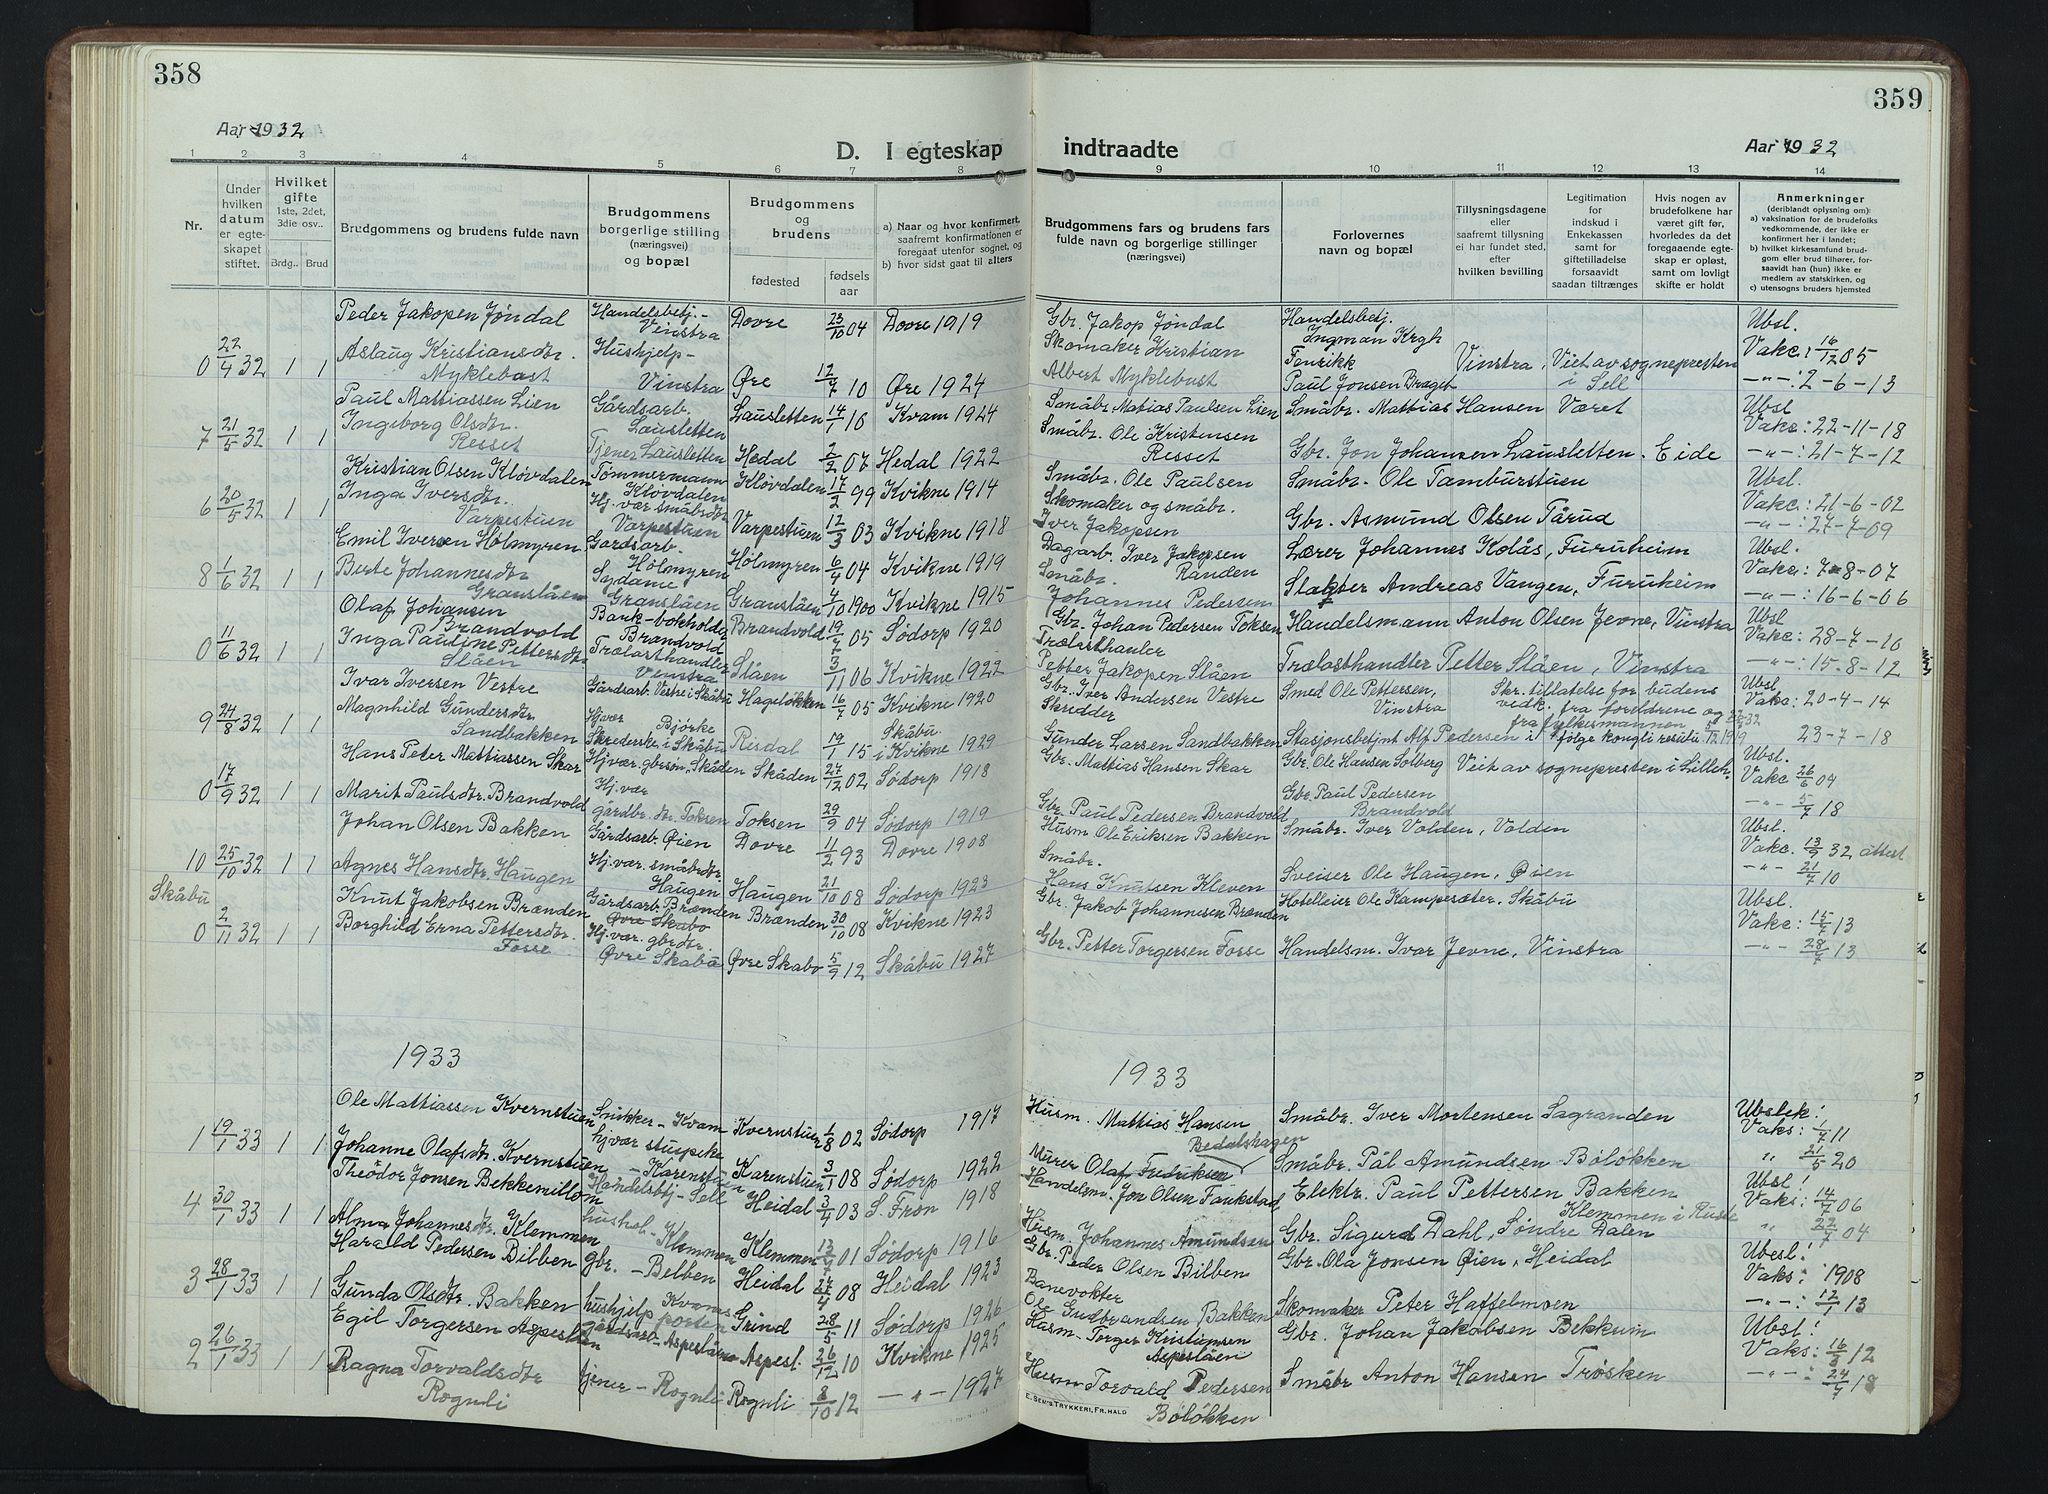 SAH, Nord-Fron prestekontor, Klokkerbok nr. 7, 1915-1946, s. 358-359